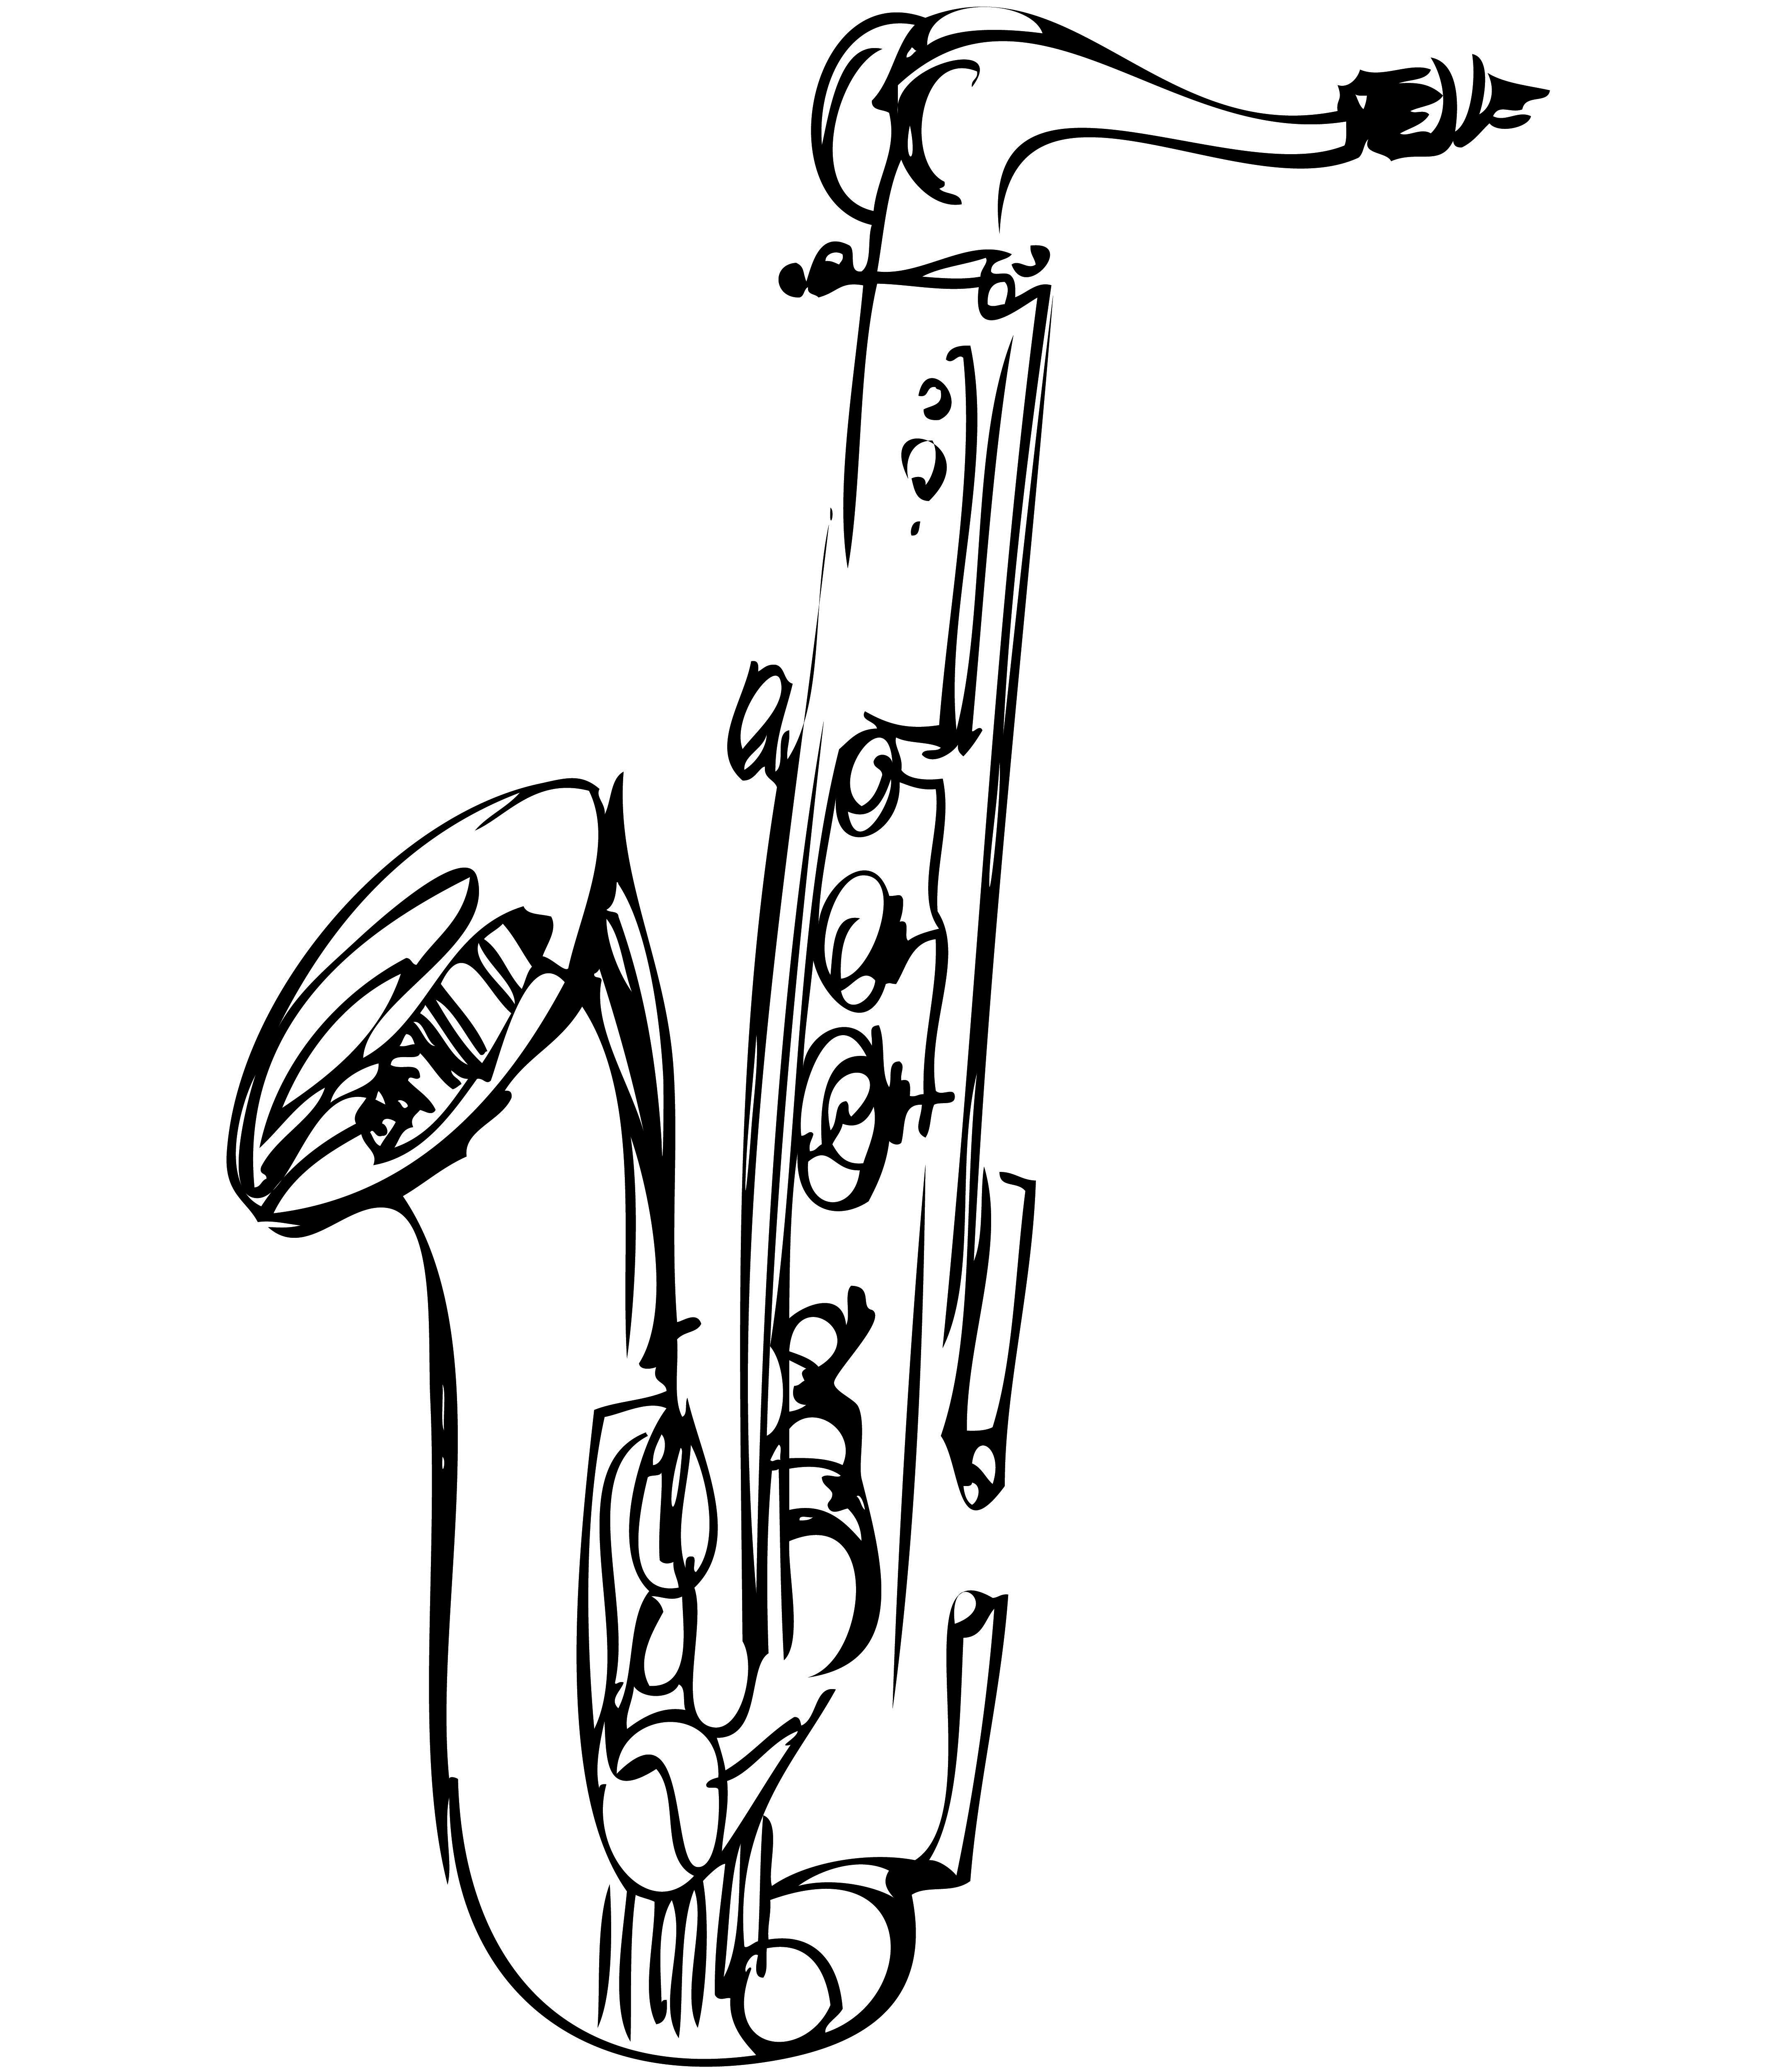 9 baritone saxophone clipart.